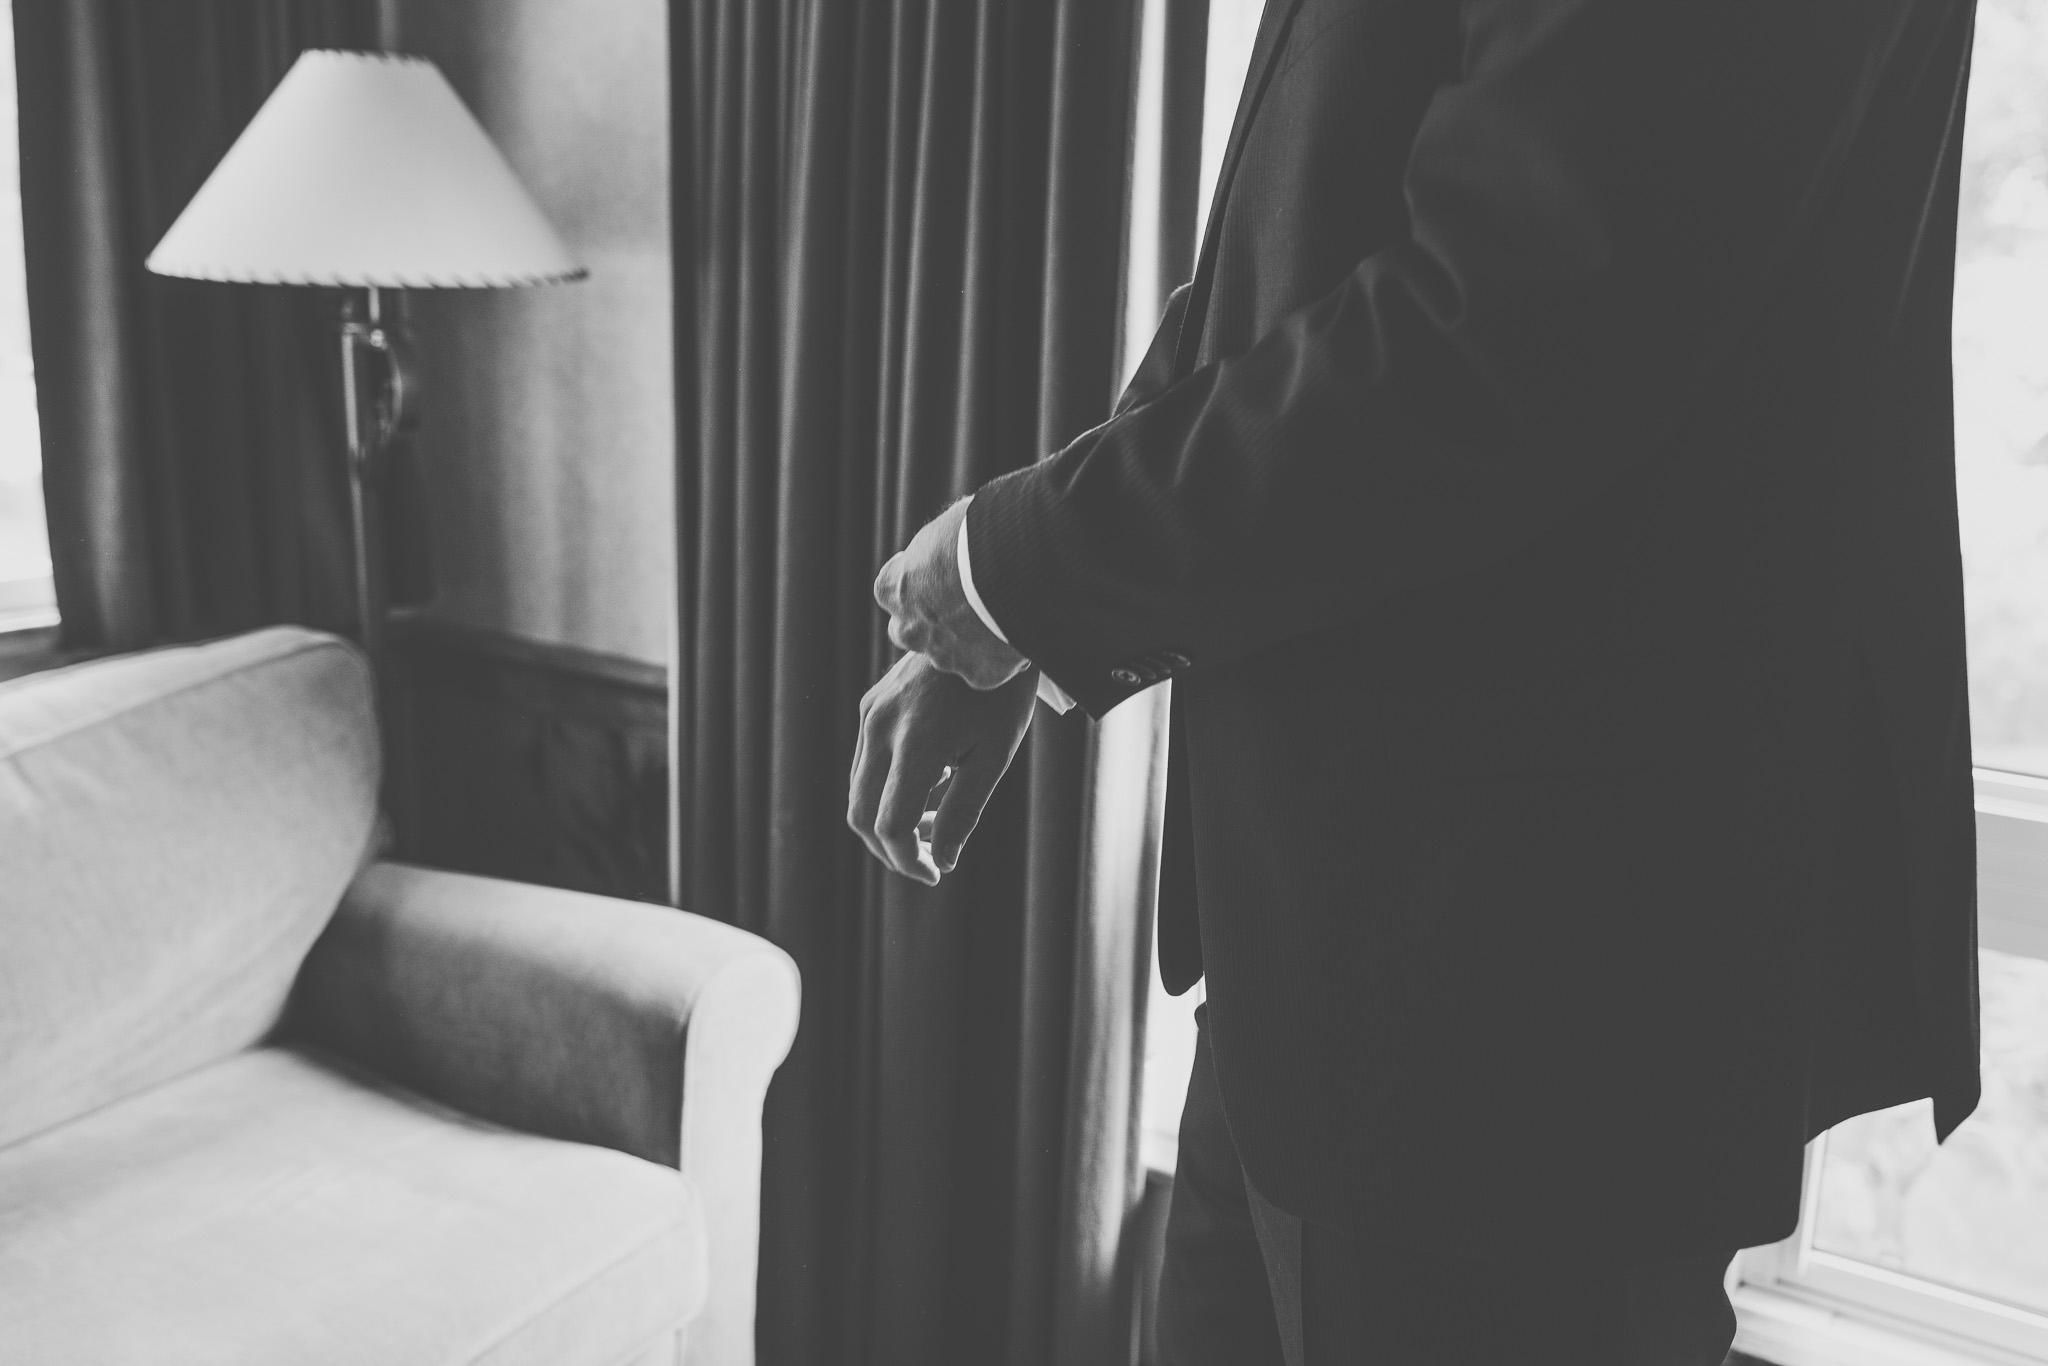 cottage wedding, keene, ontario, cottage, quiet wedding, wedding on the lake, toronto photographer, toronto photography, northumberland county, port hope photographer, port hope wedding photographer, toronto wedding photographer, bride, groom, summer wedding, peterborough wedding, peterborough wedding photography, peterborough wedding photographer, keene wedding, keene wedding photographer, documentary wedding photography, documentary wedding photographer, candid wedding photography, cottage, trees, nature, veil, intimate wedding, black and white, getting ready, window light, groom, details